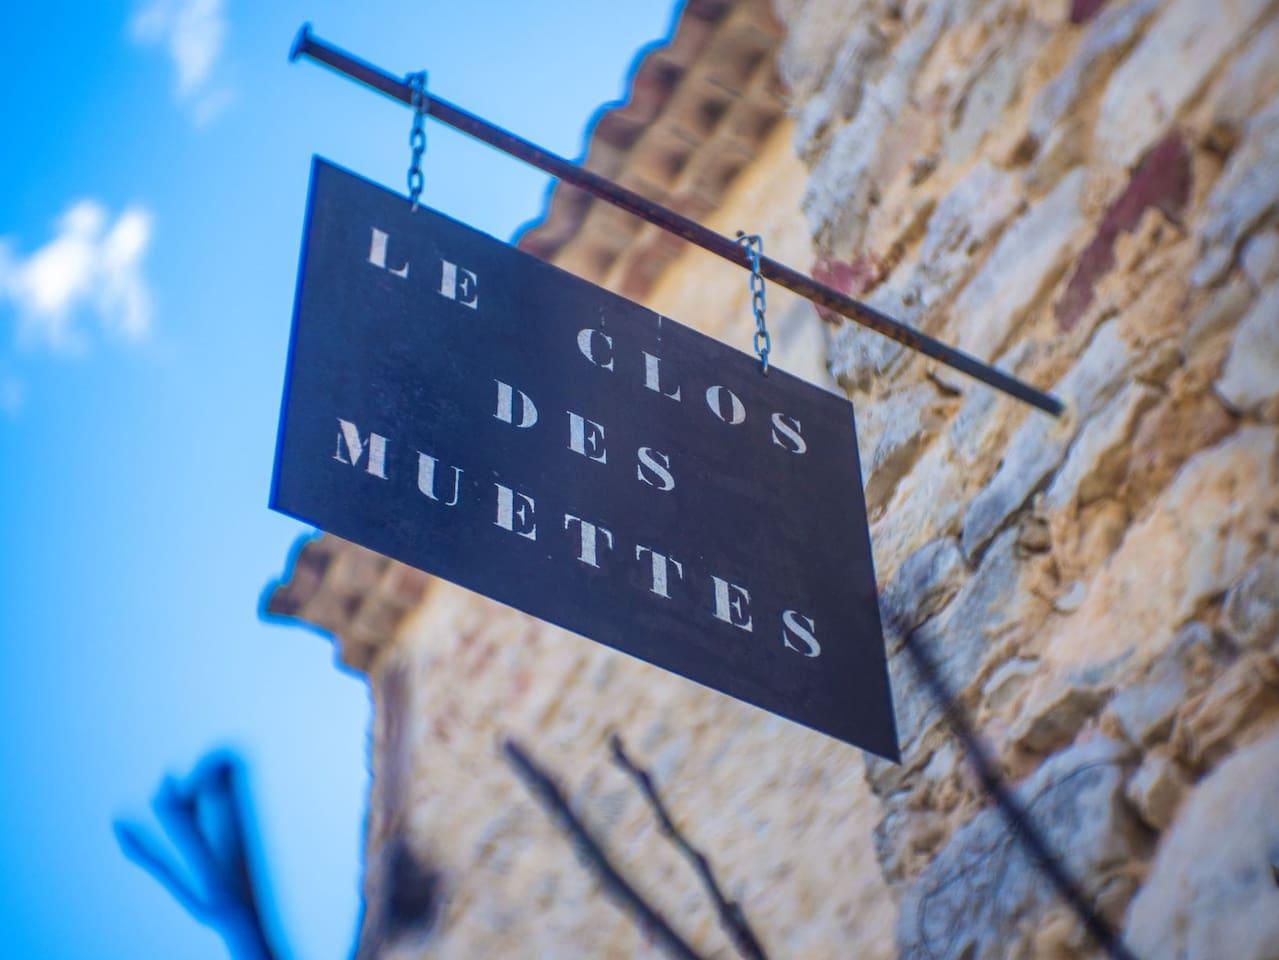 CLOS DES MUETTES